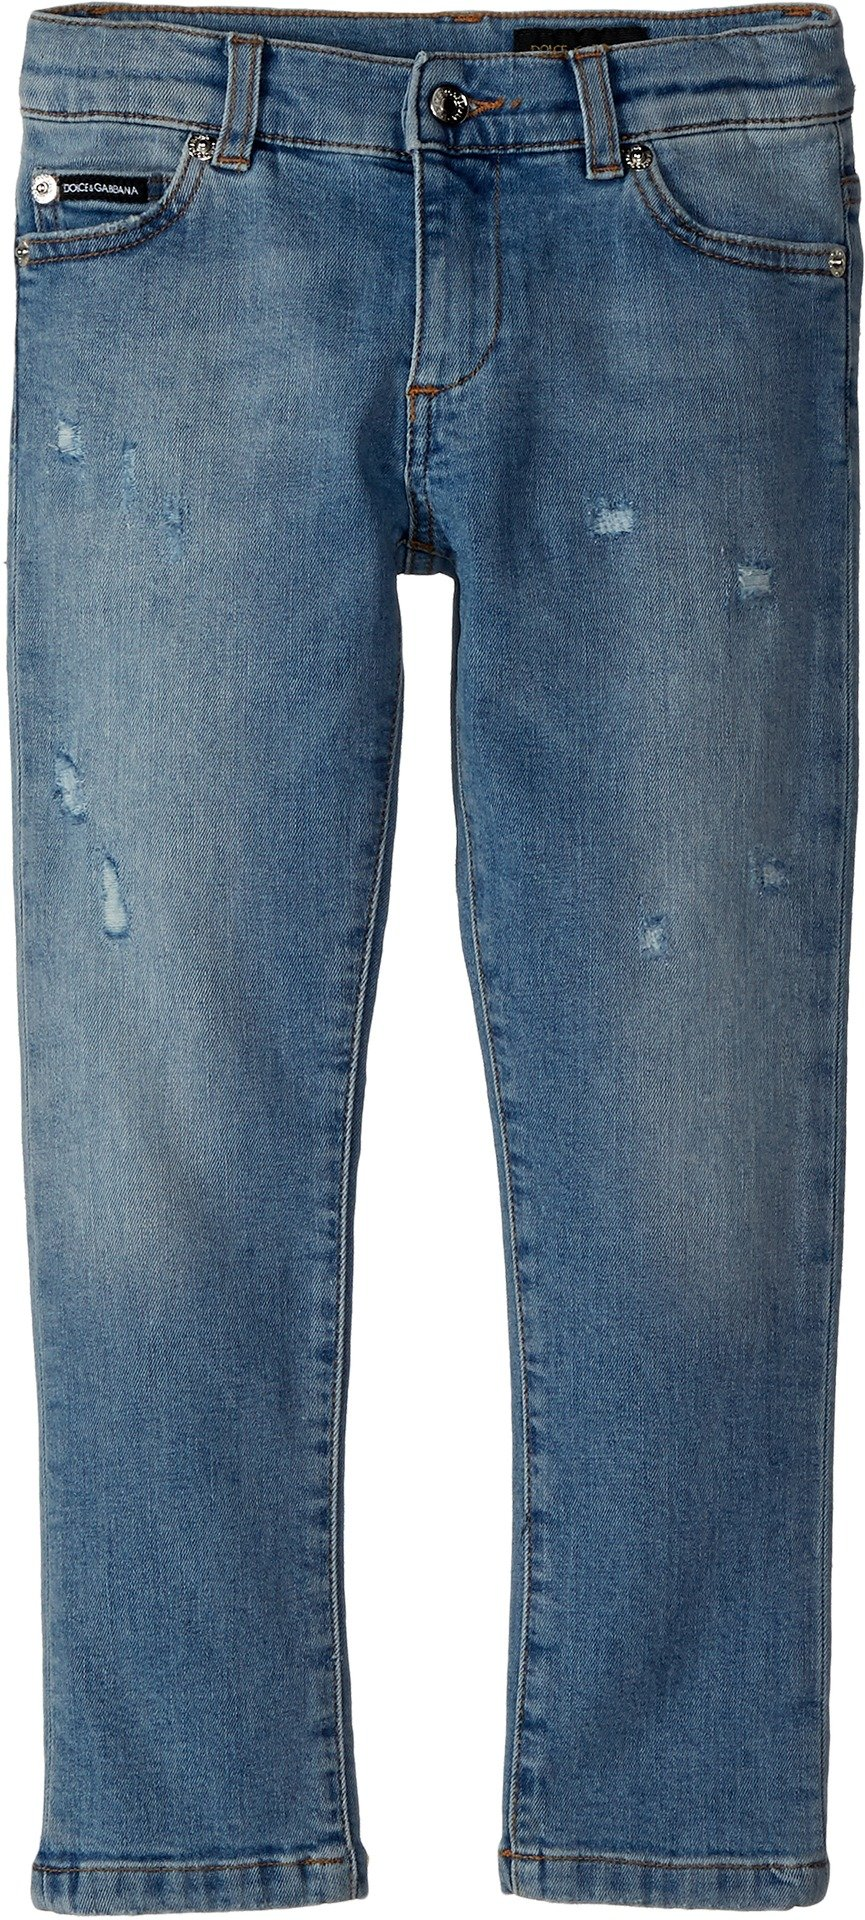 Dolce & Gabbana Kids Baby Boy's Five-Pocket Trousers (Toddler/Little Kids) Dark Blue 4T